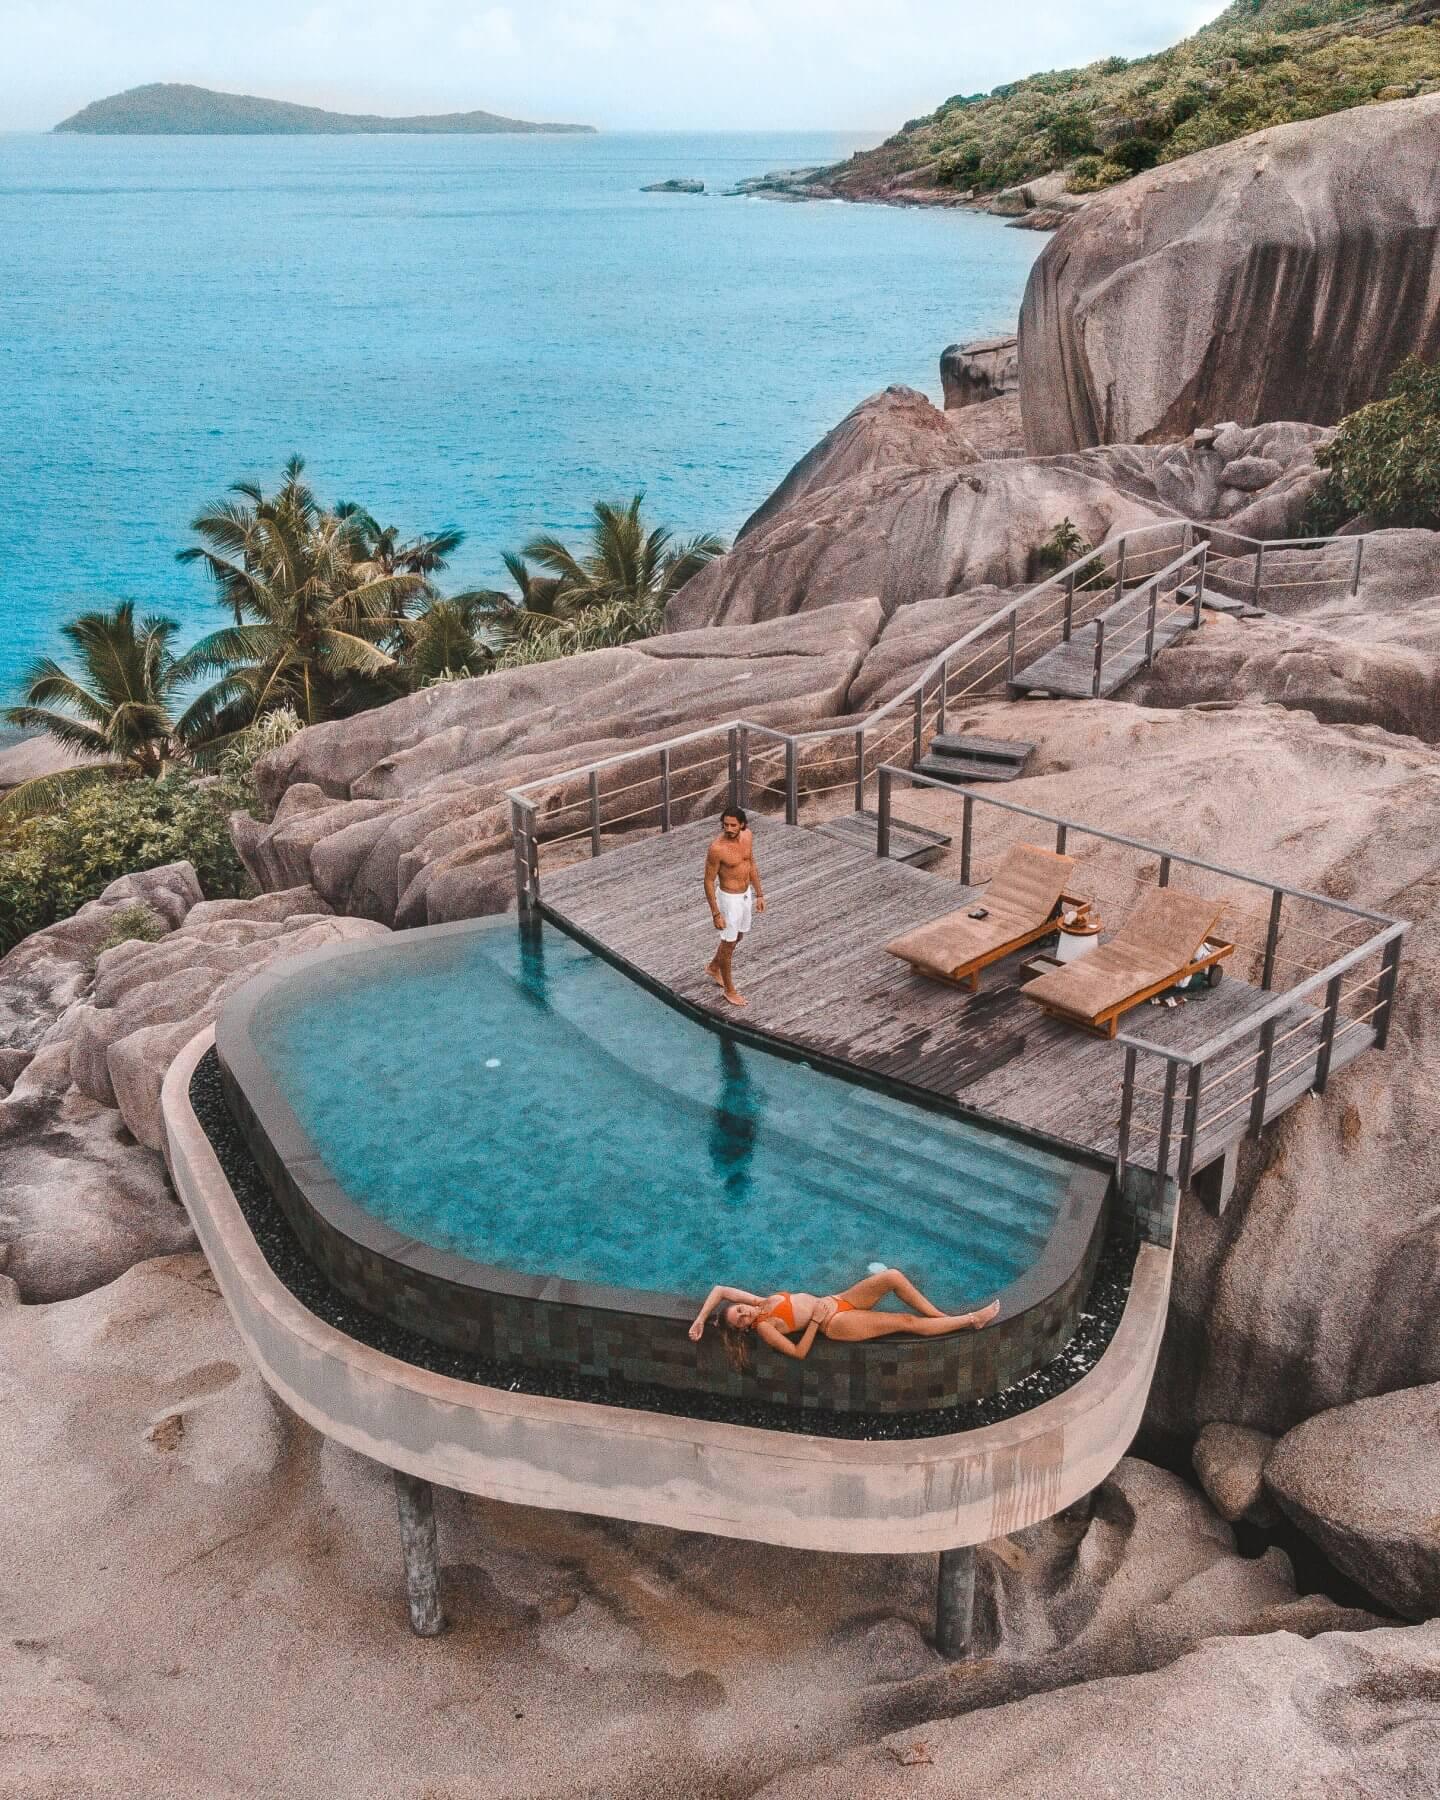 Swimming Pool in the rocks at Six Senses Zil Pasyon